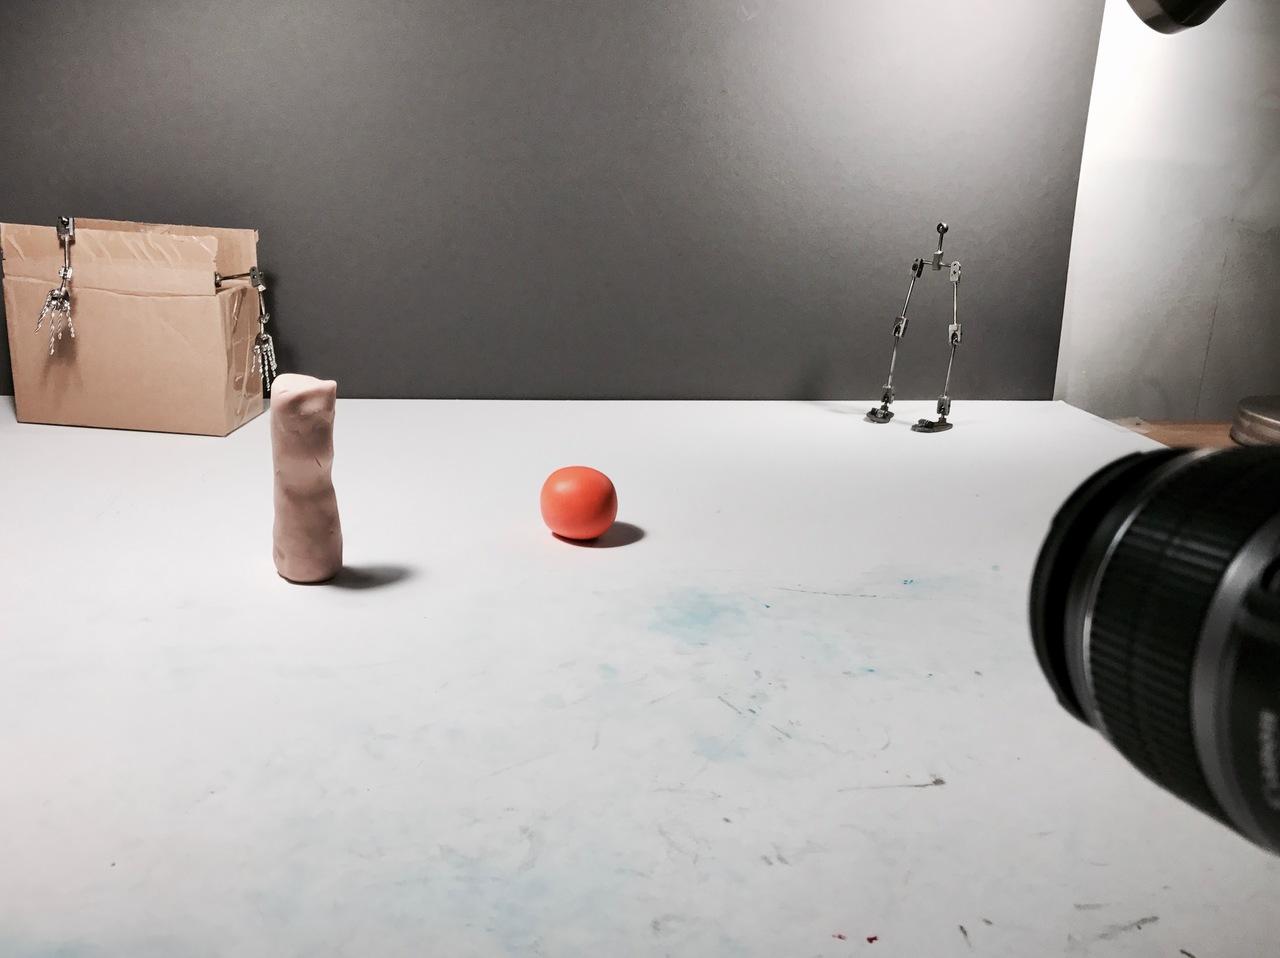 Bouncing a Clay Ball